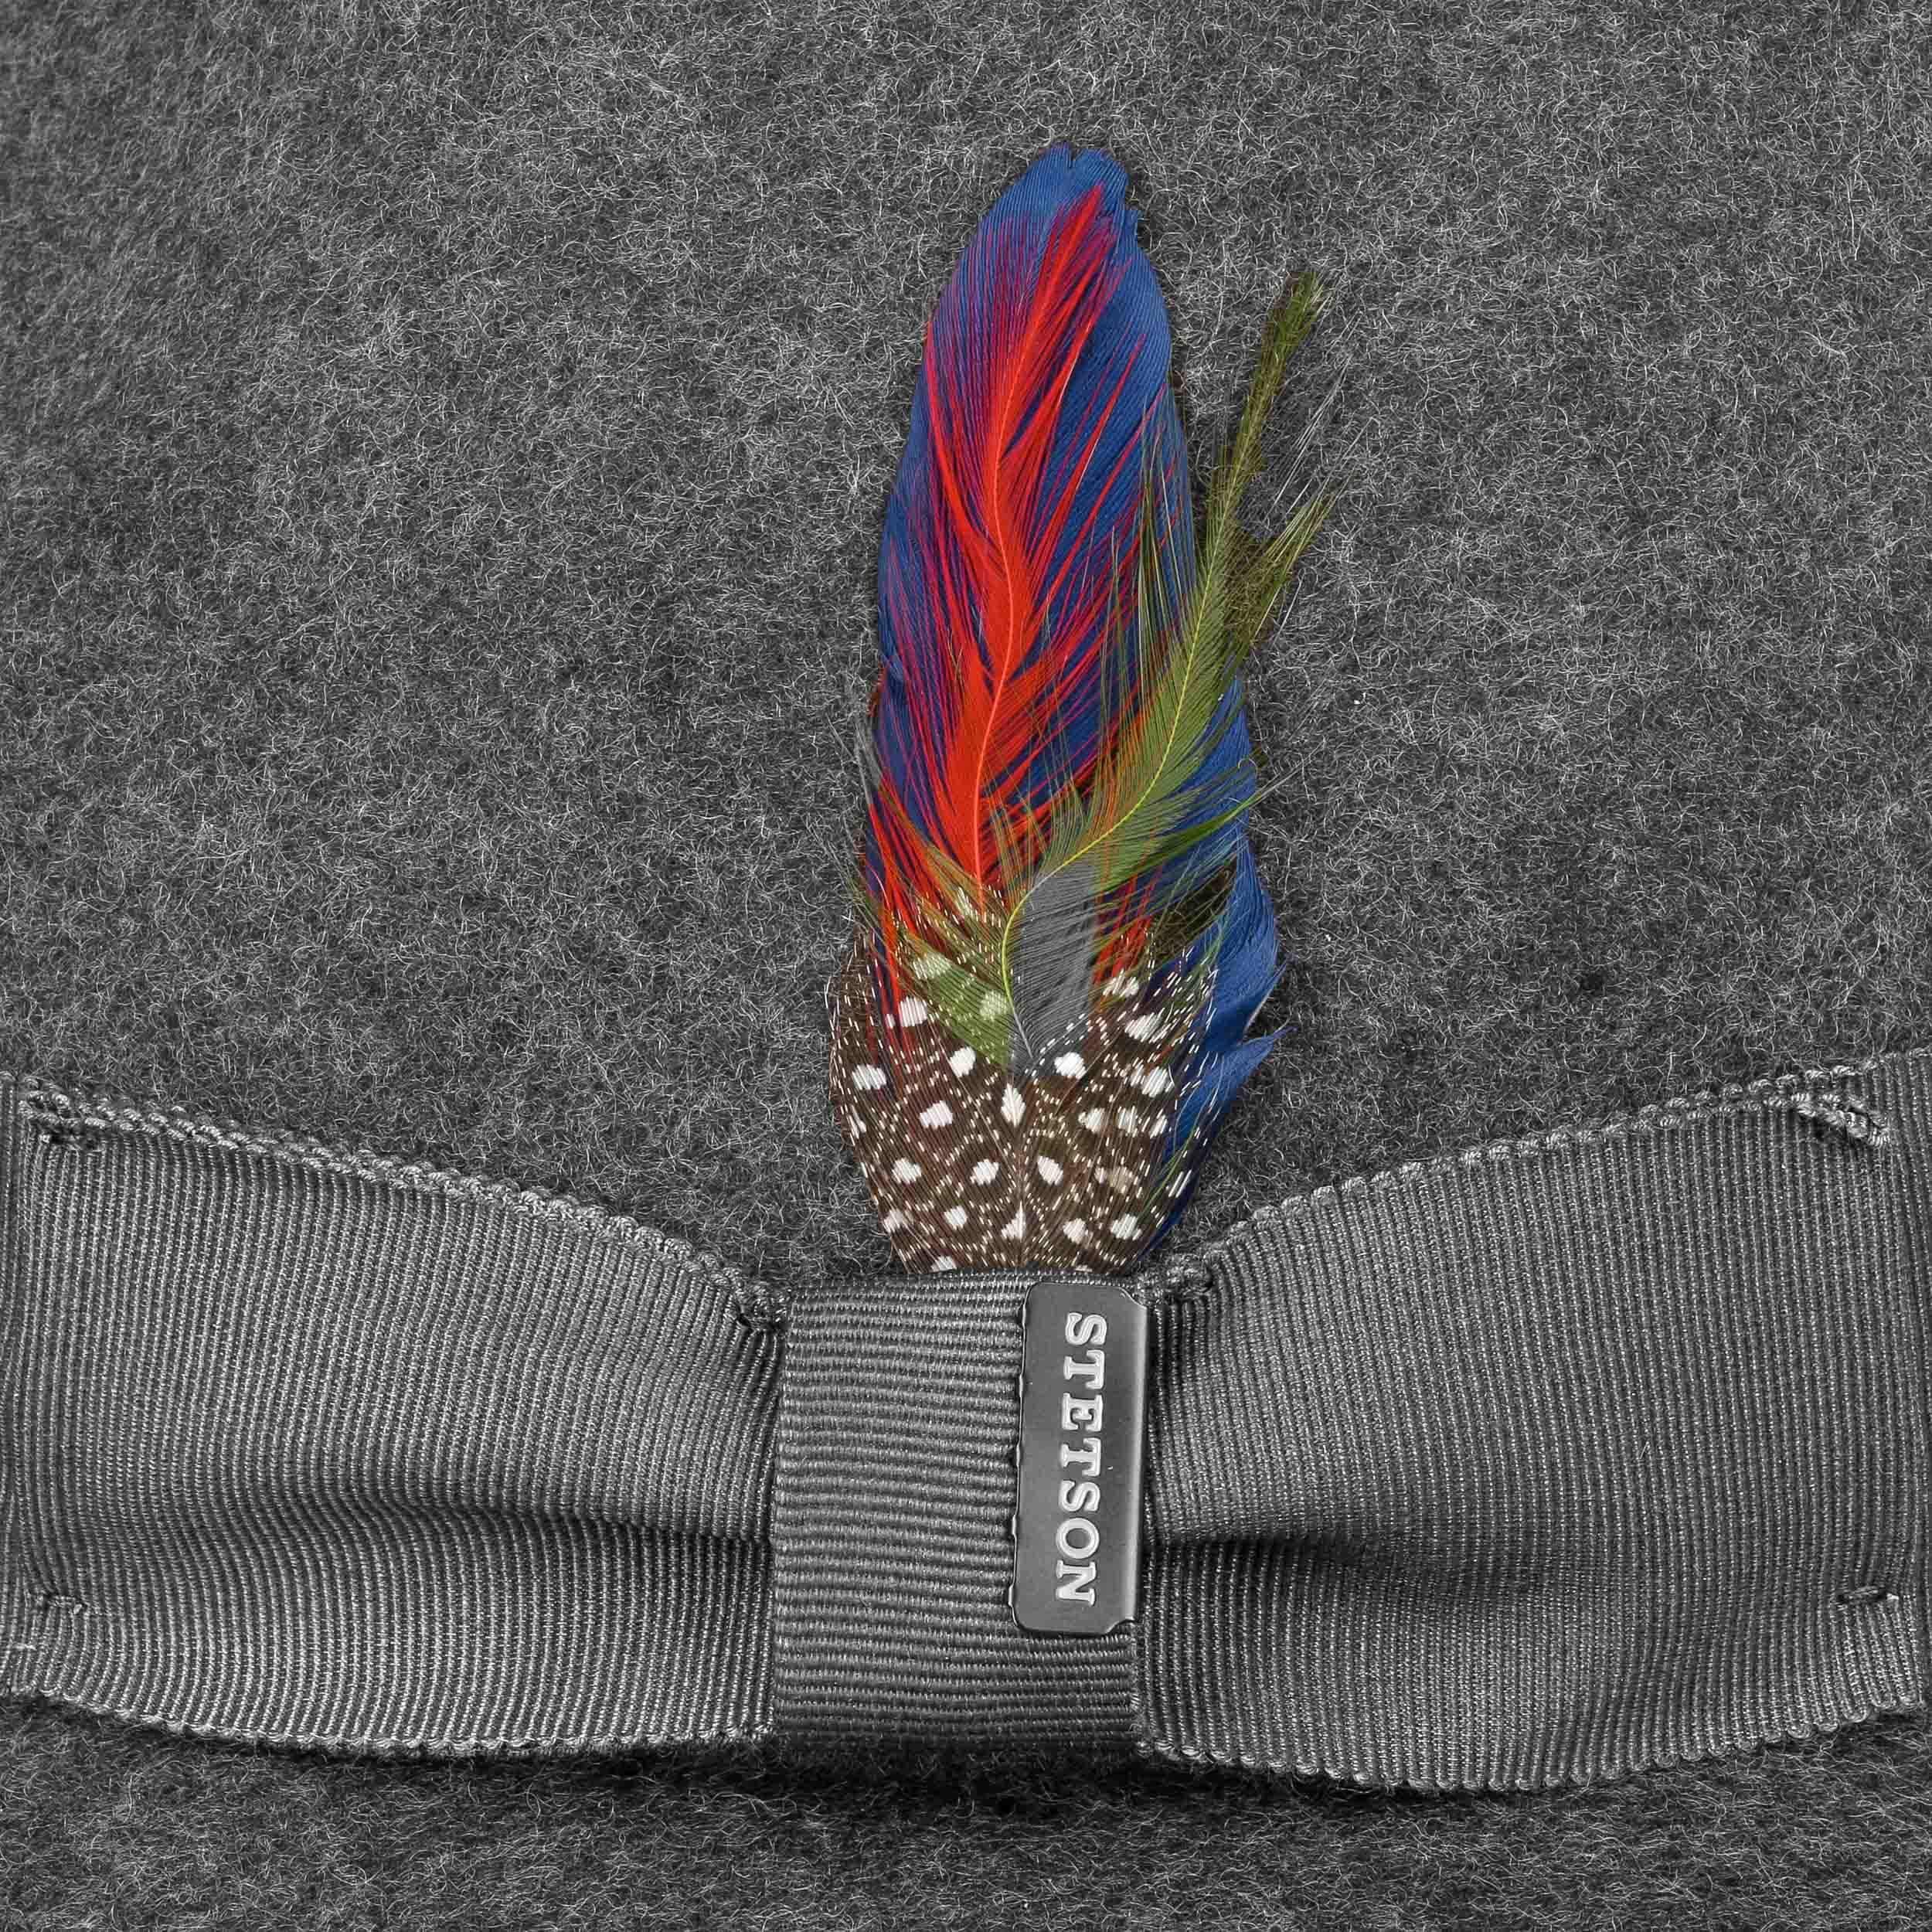 Colour Change Damen Schlapphut grau